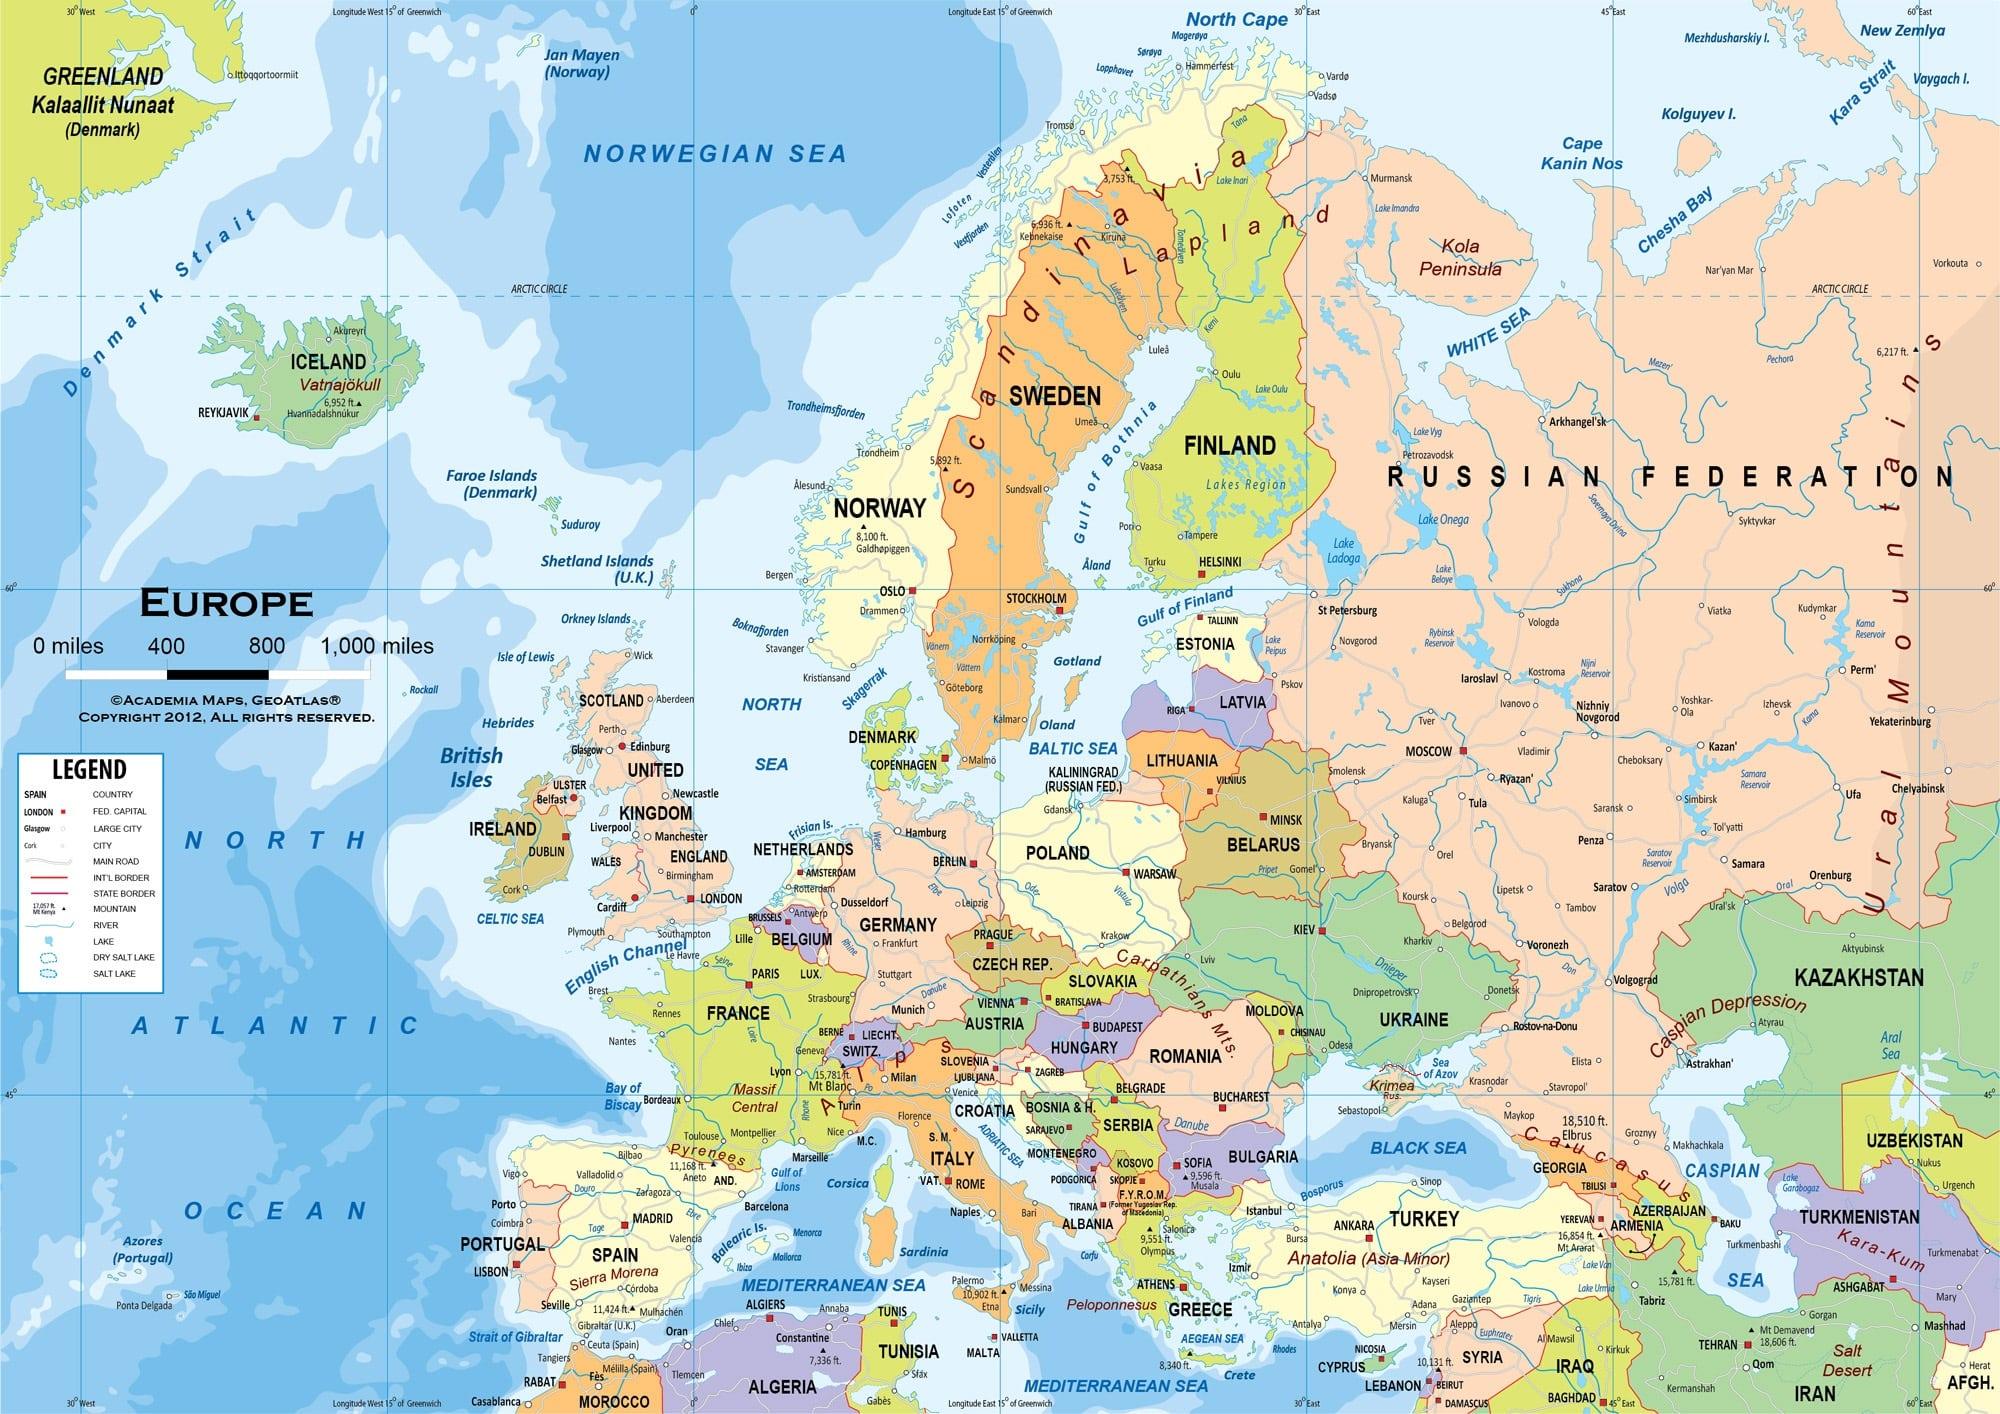 Carte De Leurope Avec Les Villes.Cartograf Fr Carte Europe Page 7